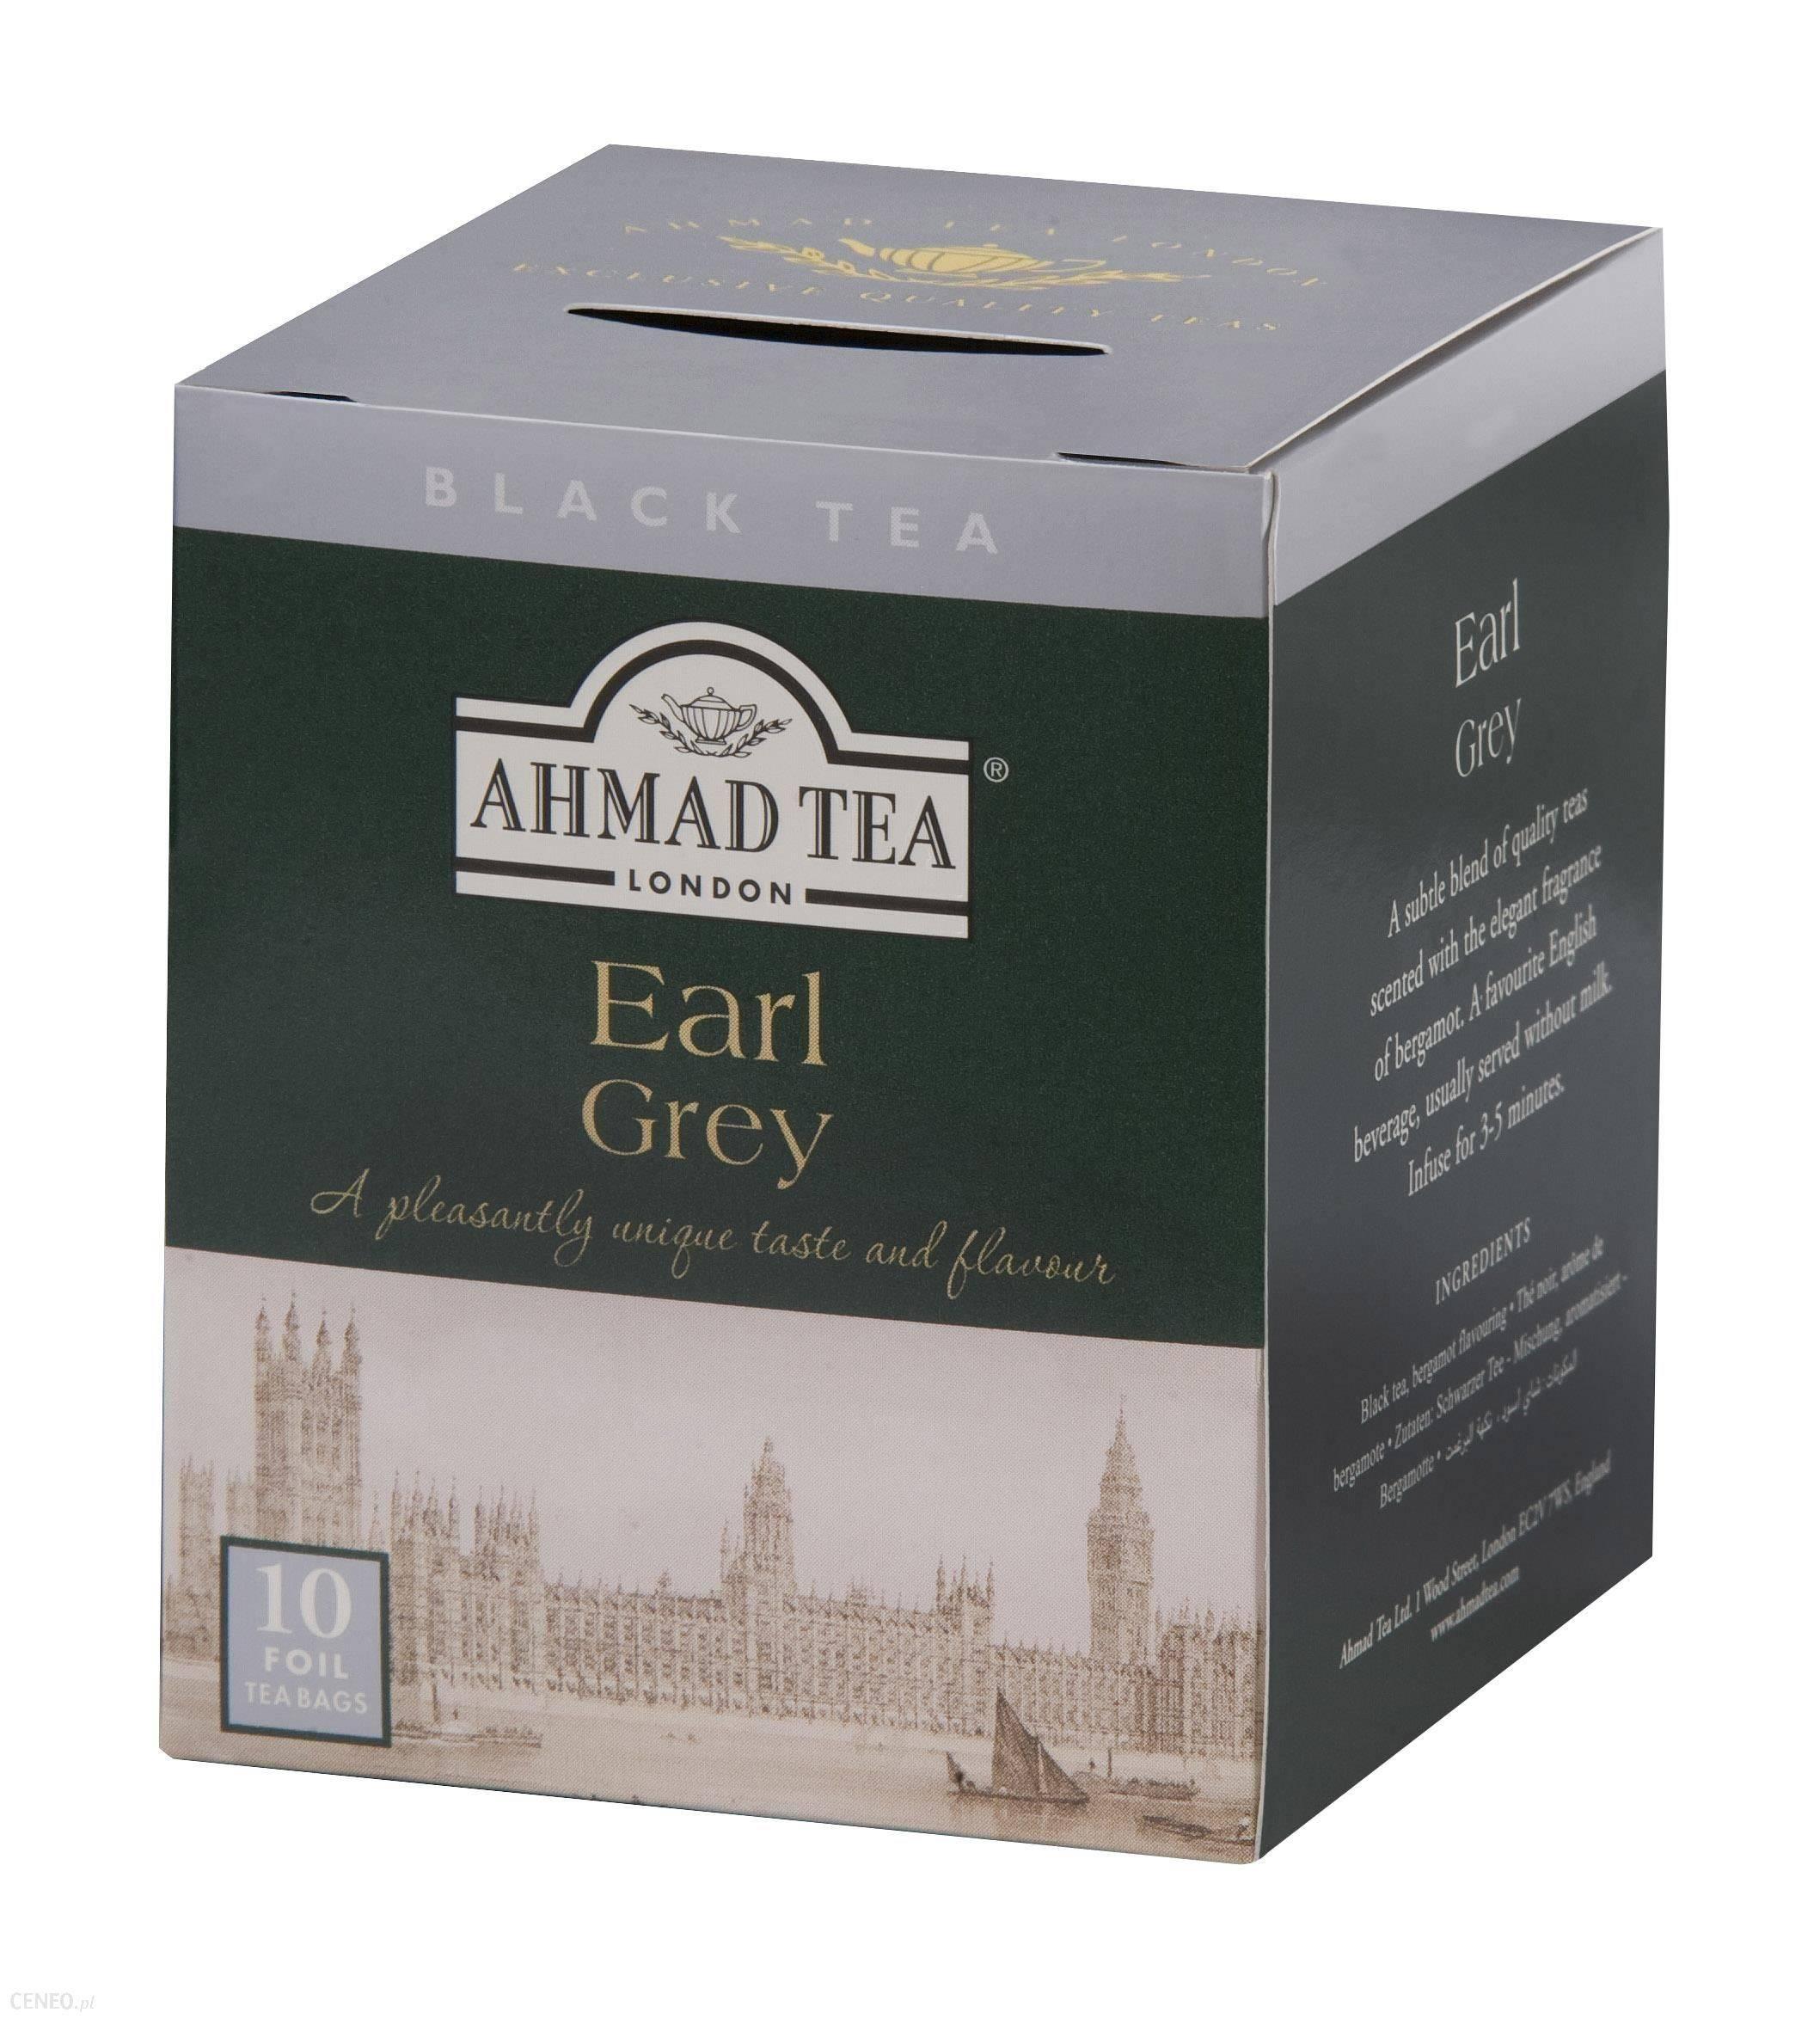 Чай с бергамотом это эрл грей